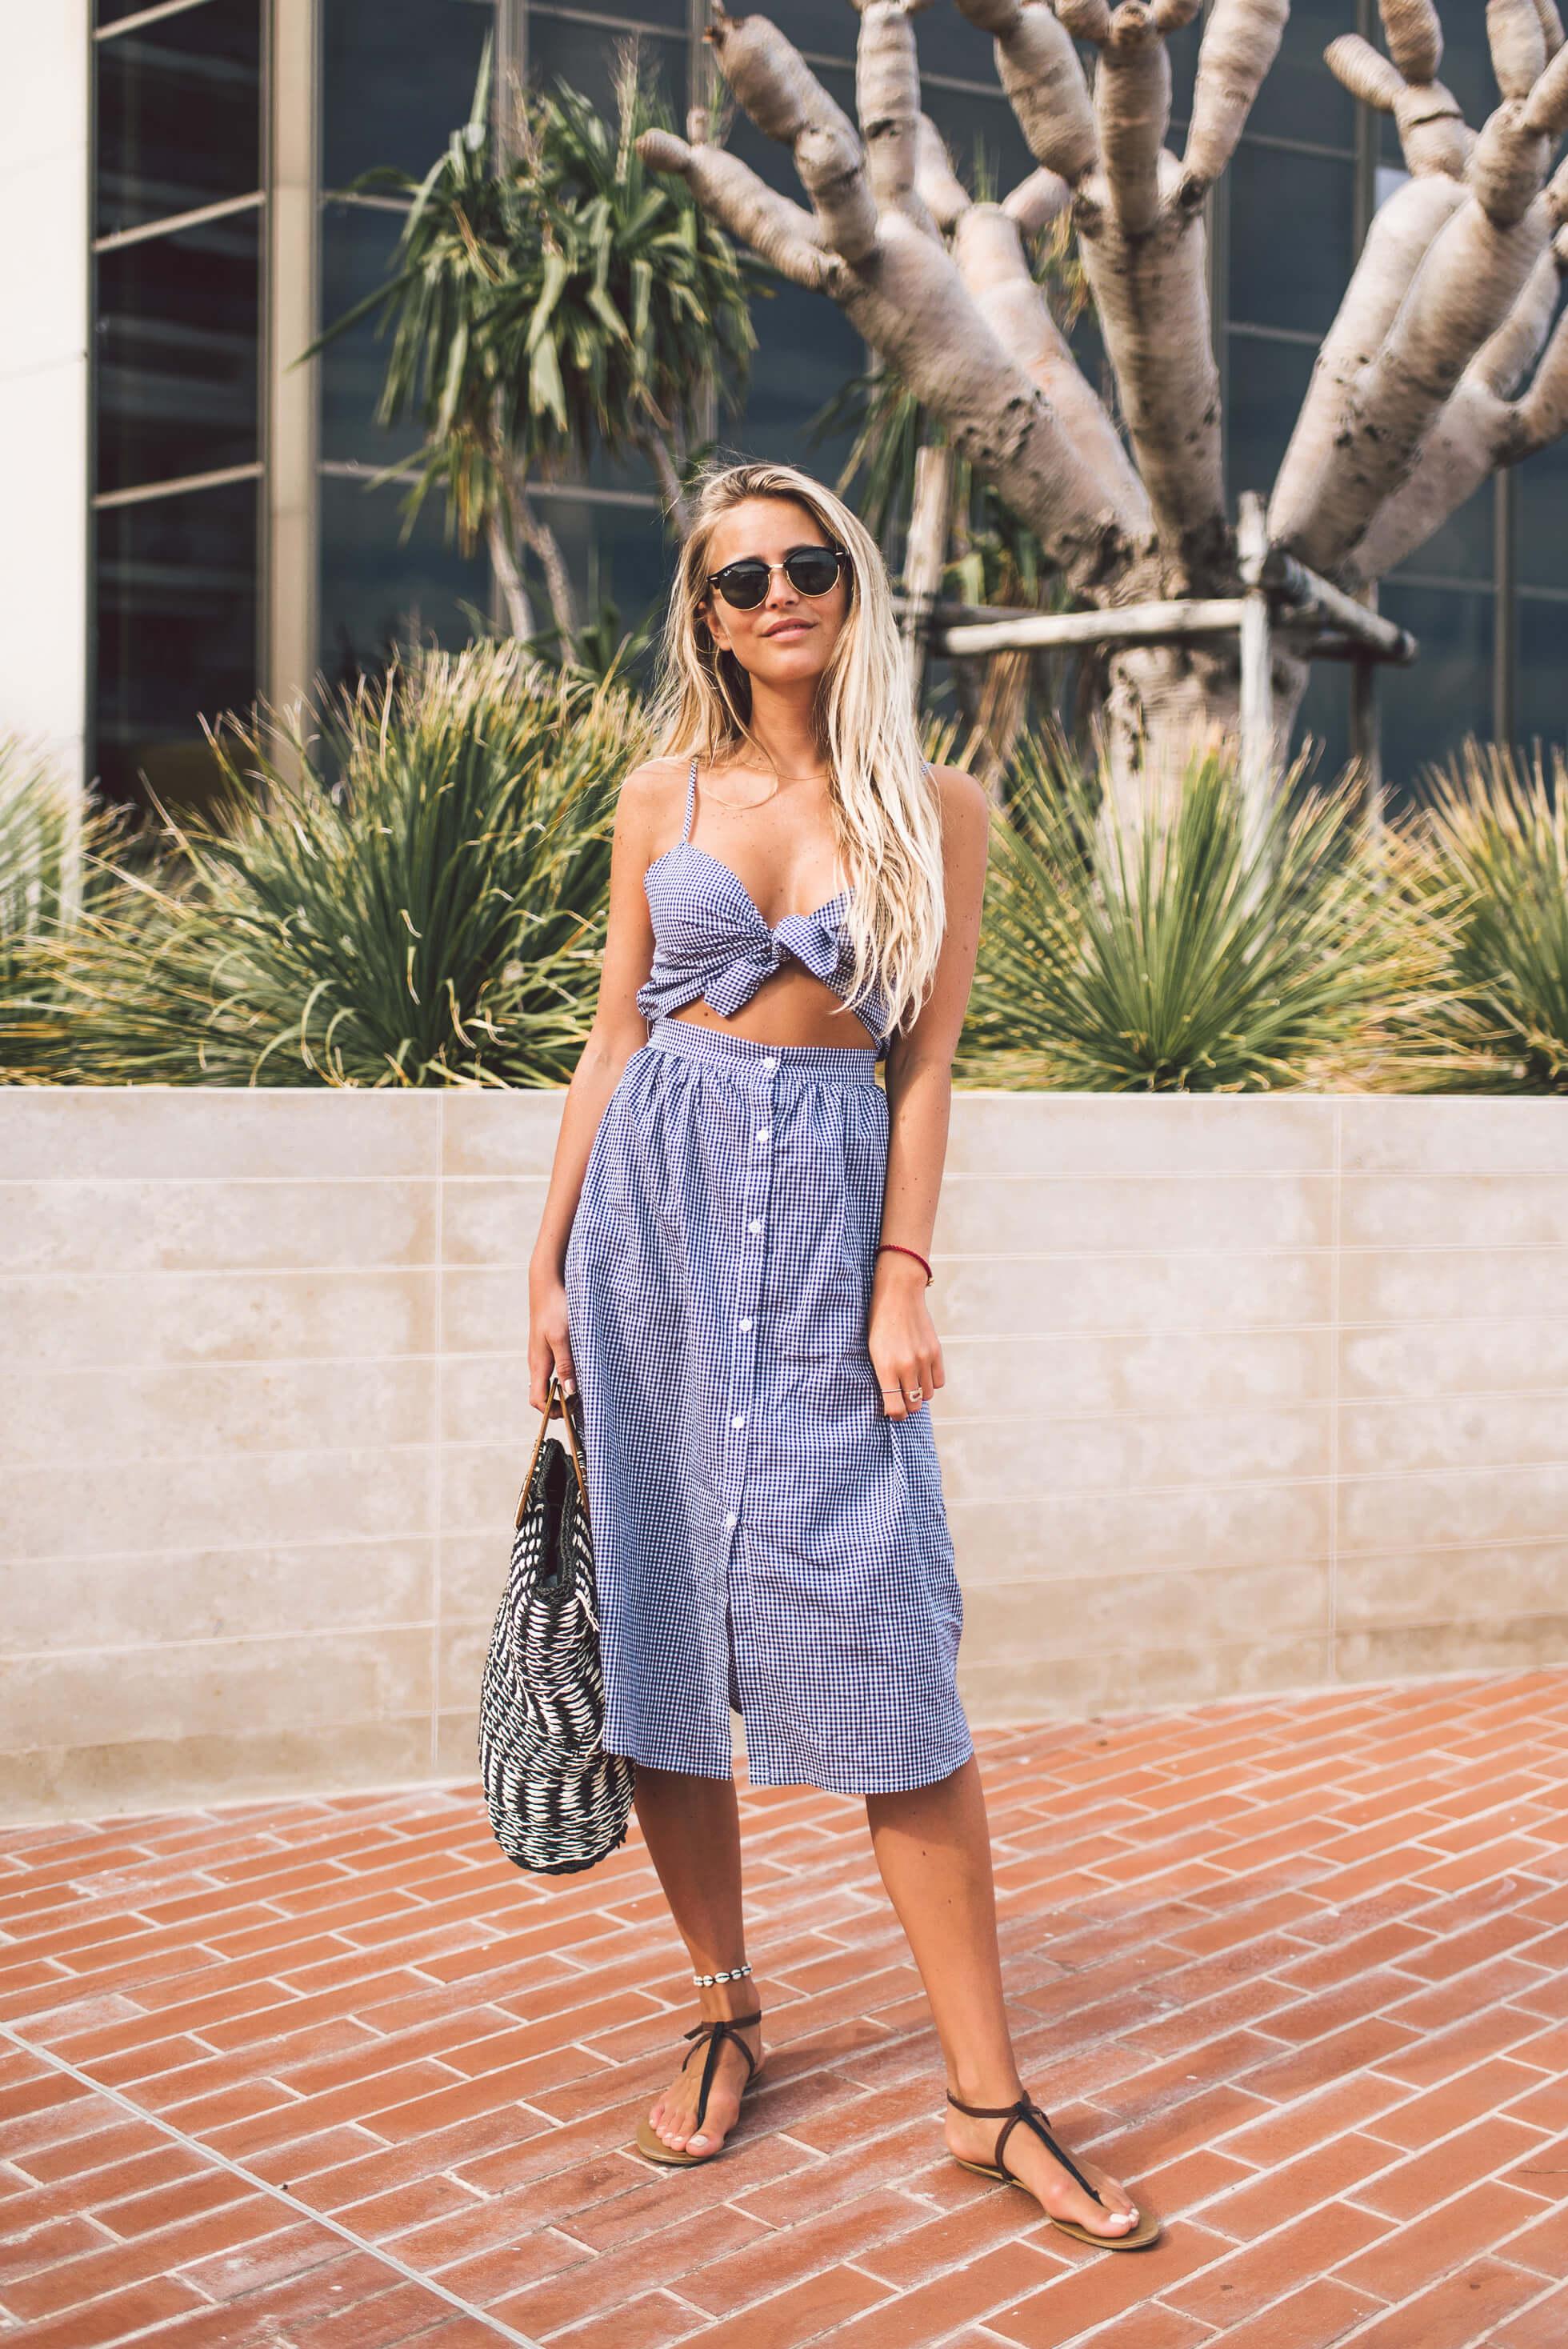 janni-deler-summer-dressDSC_6493